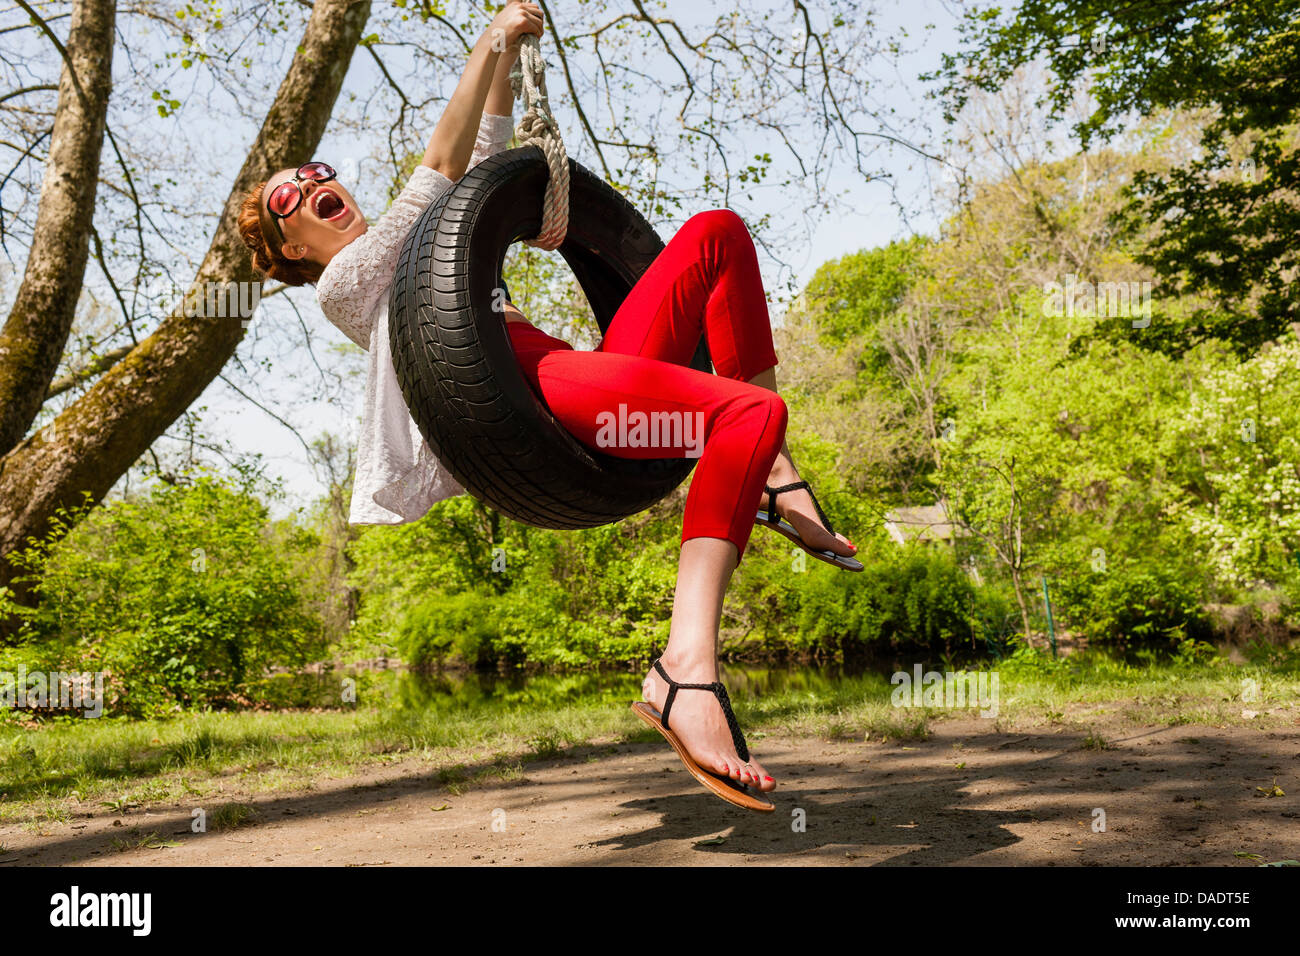 Young woman having fun on tire swing - Stock Image